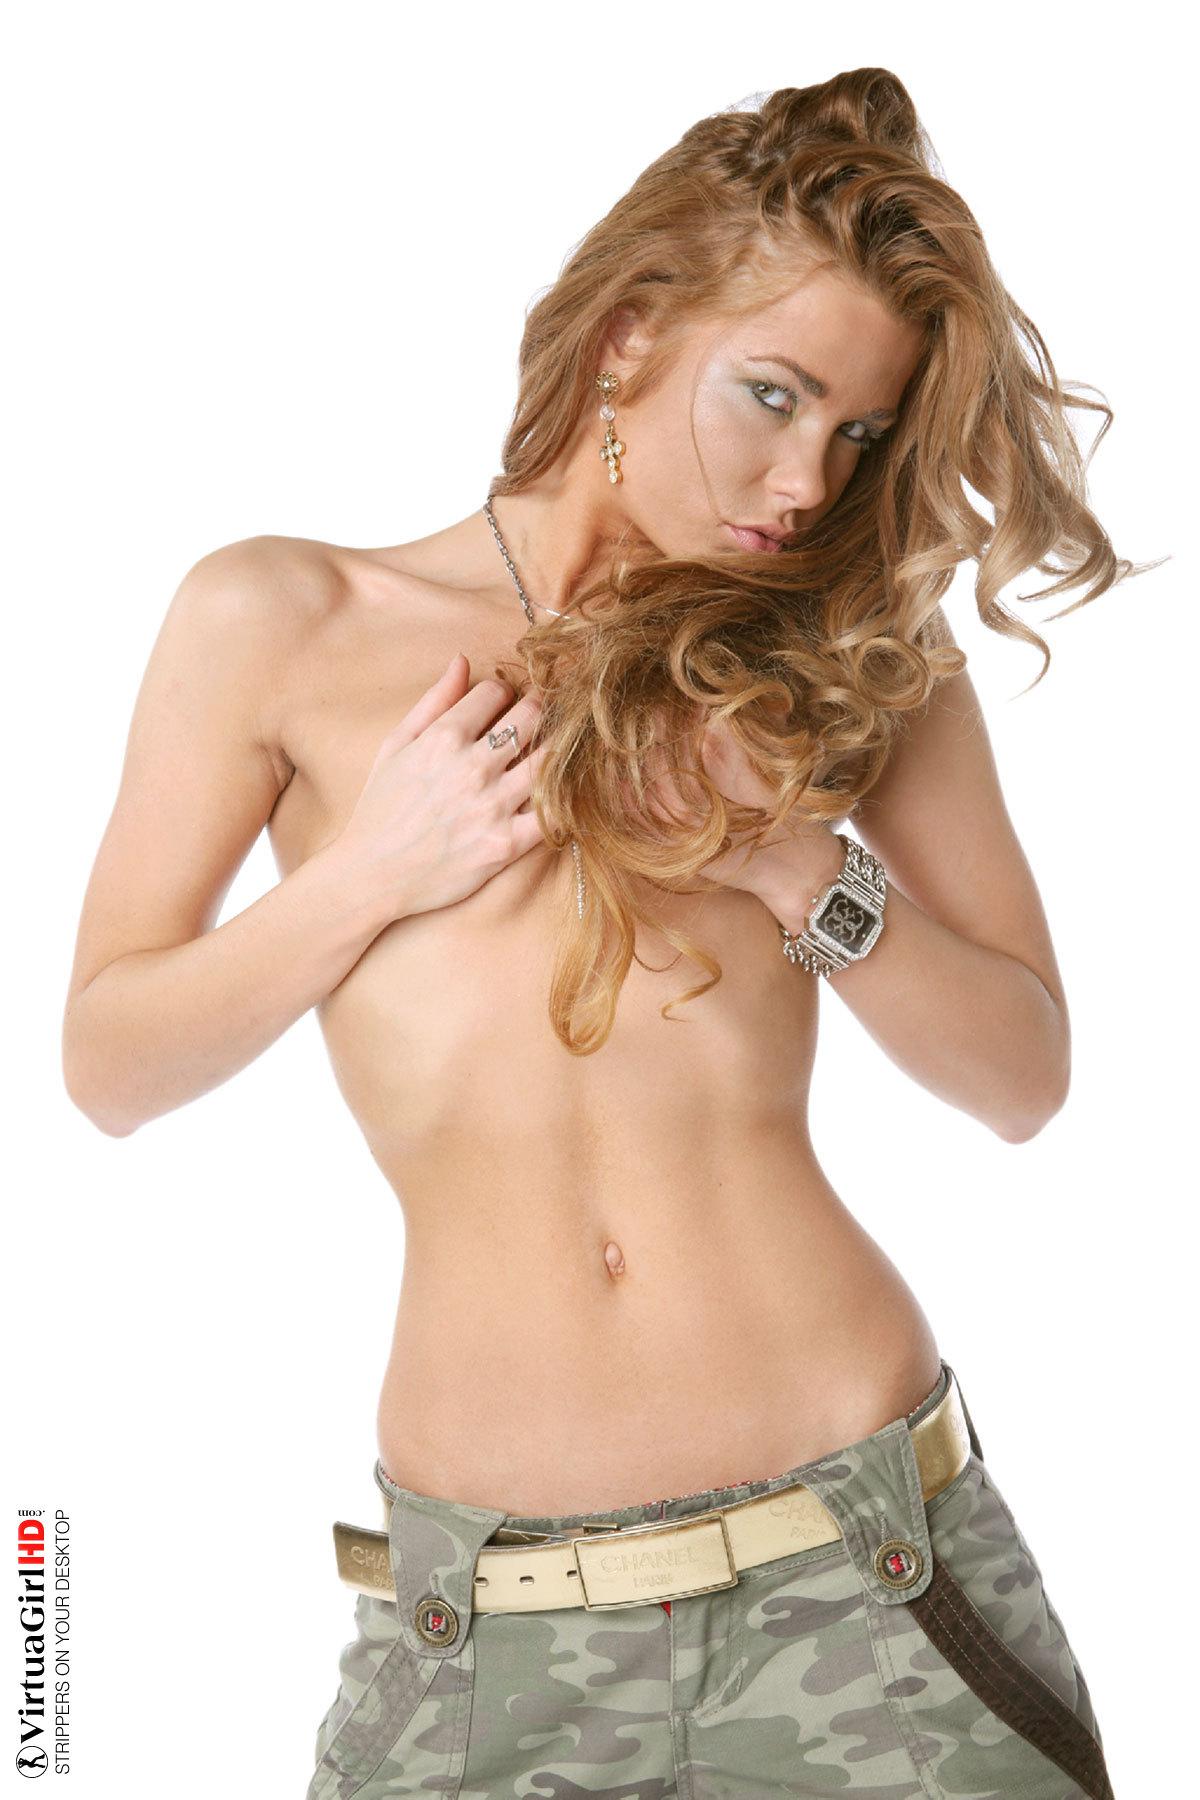 girl boobs wallpaper